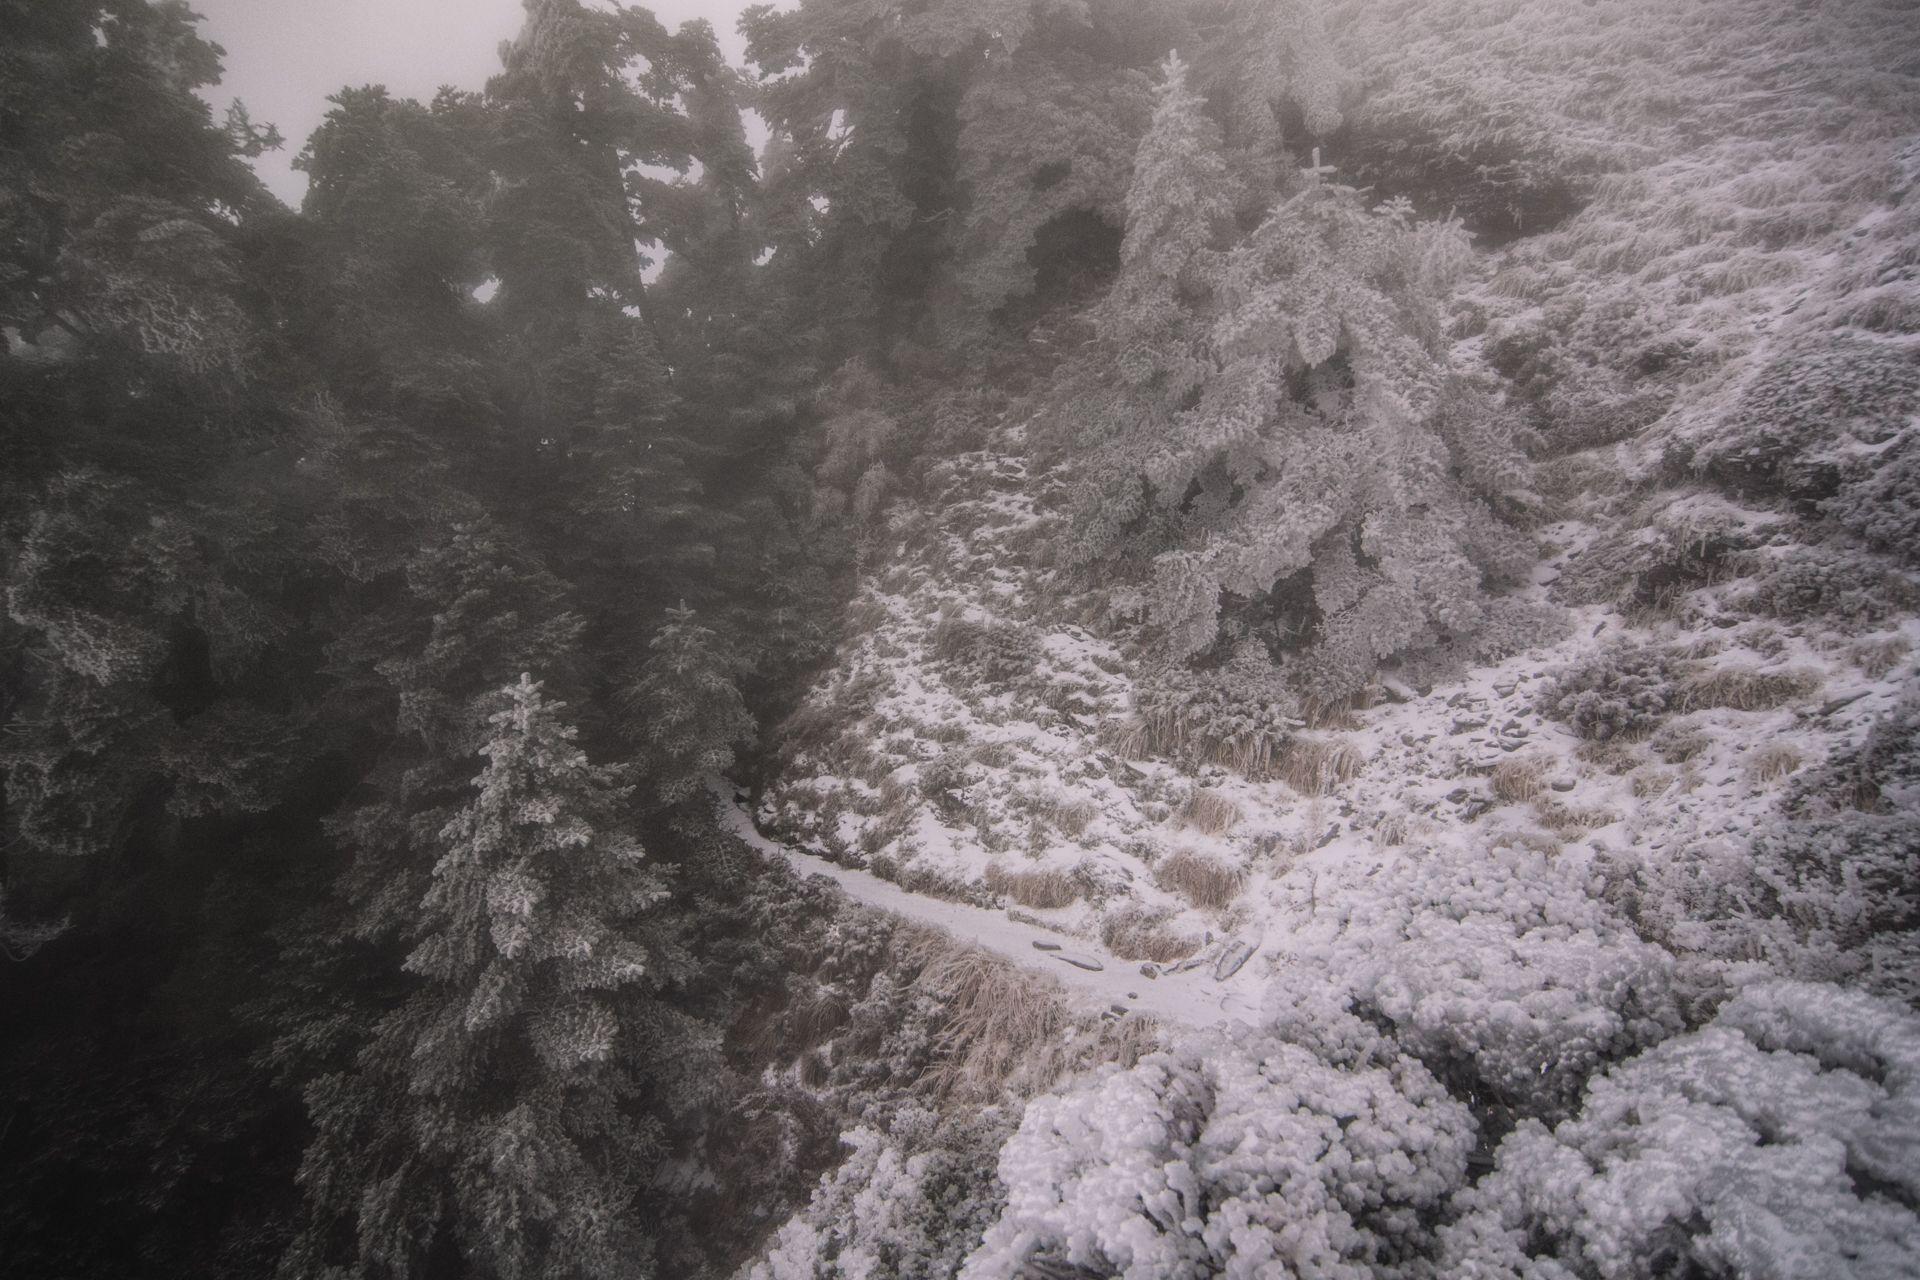 Taiwan,Nantou - Chilai Mountain(奇萊主北)_Snow season by ChiaChu Wang #nature #photography